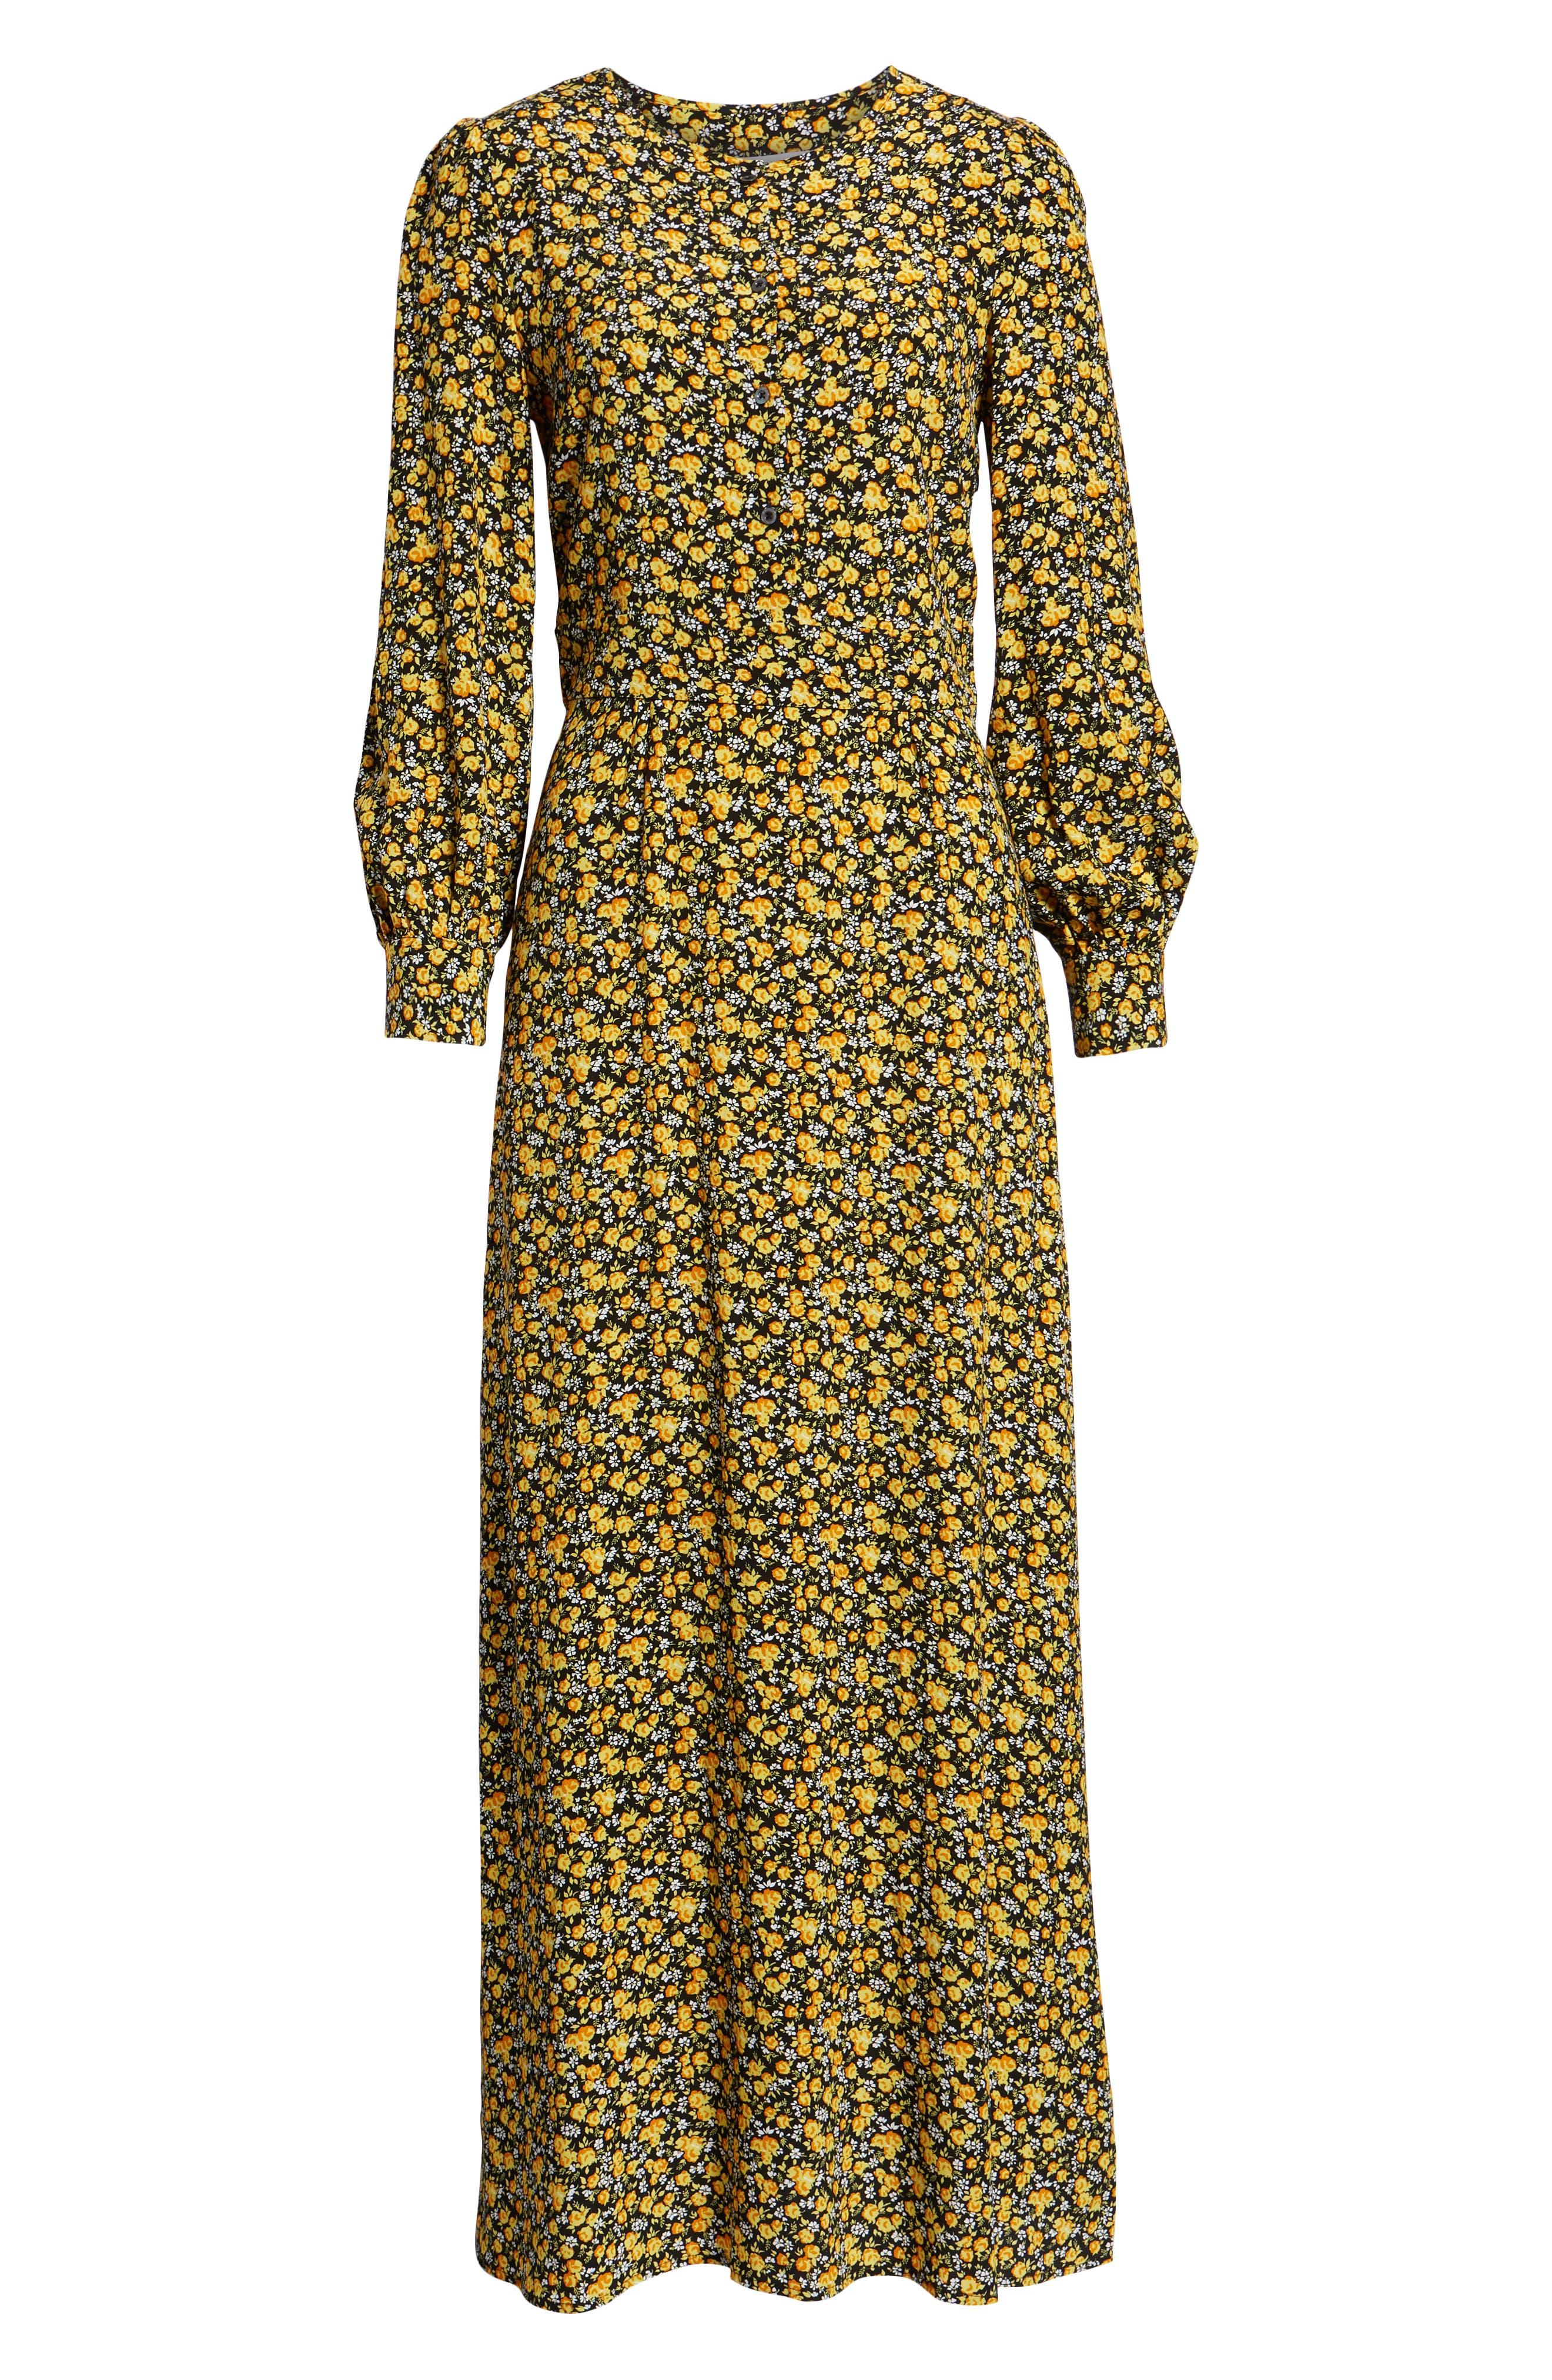 Ditzy Floral Dress,                             Alternate thumbnail 7, color,                             DITSY FLOWER